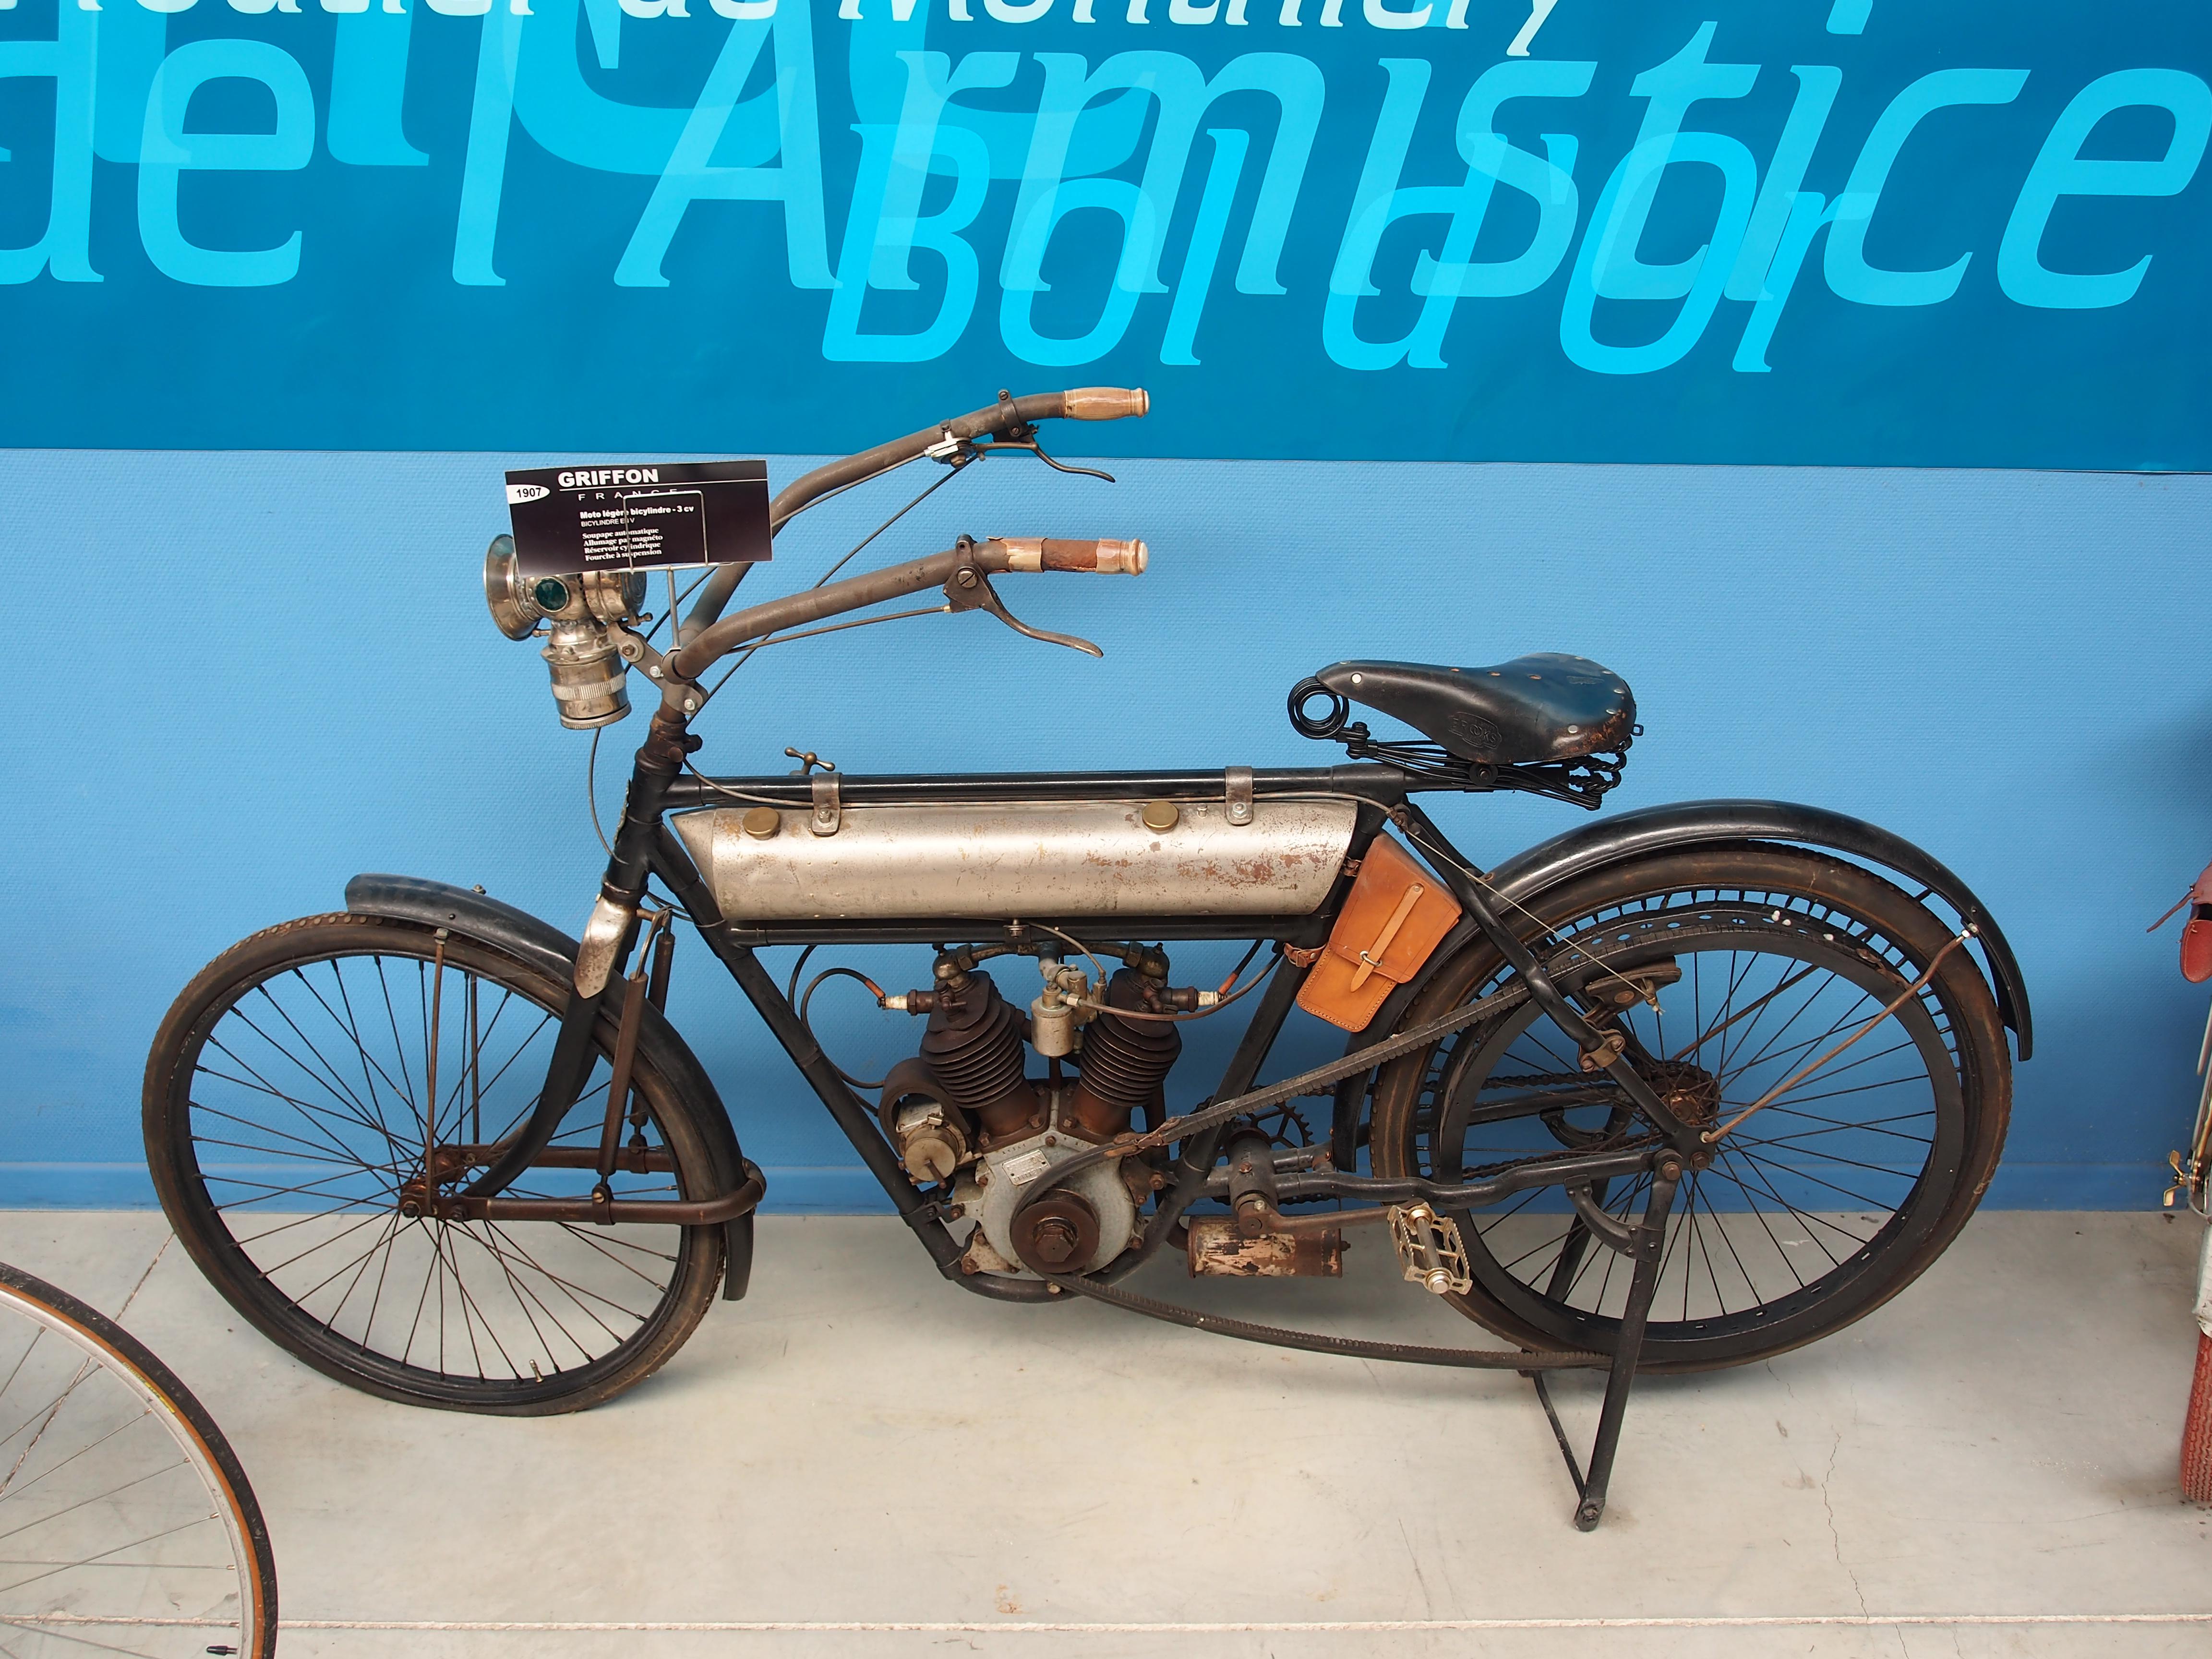 file 1907 griffon 3cv  mus u00e9e de la moto et du v u00e9lo  amneville  france  pic-001 jpg